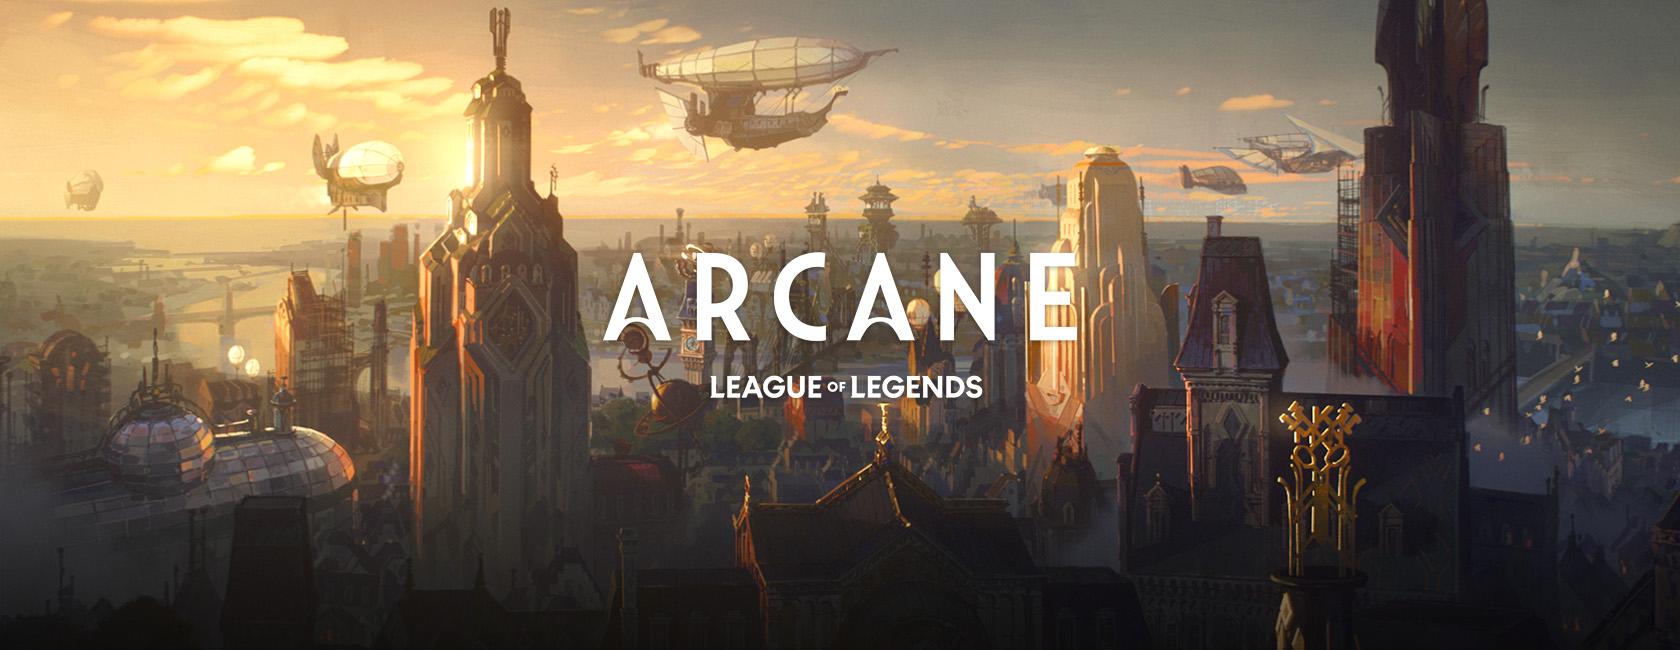 Arcane Promo